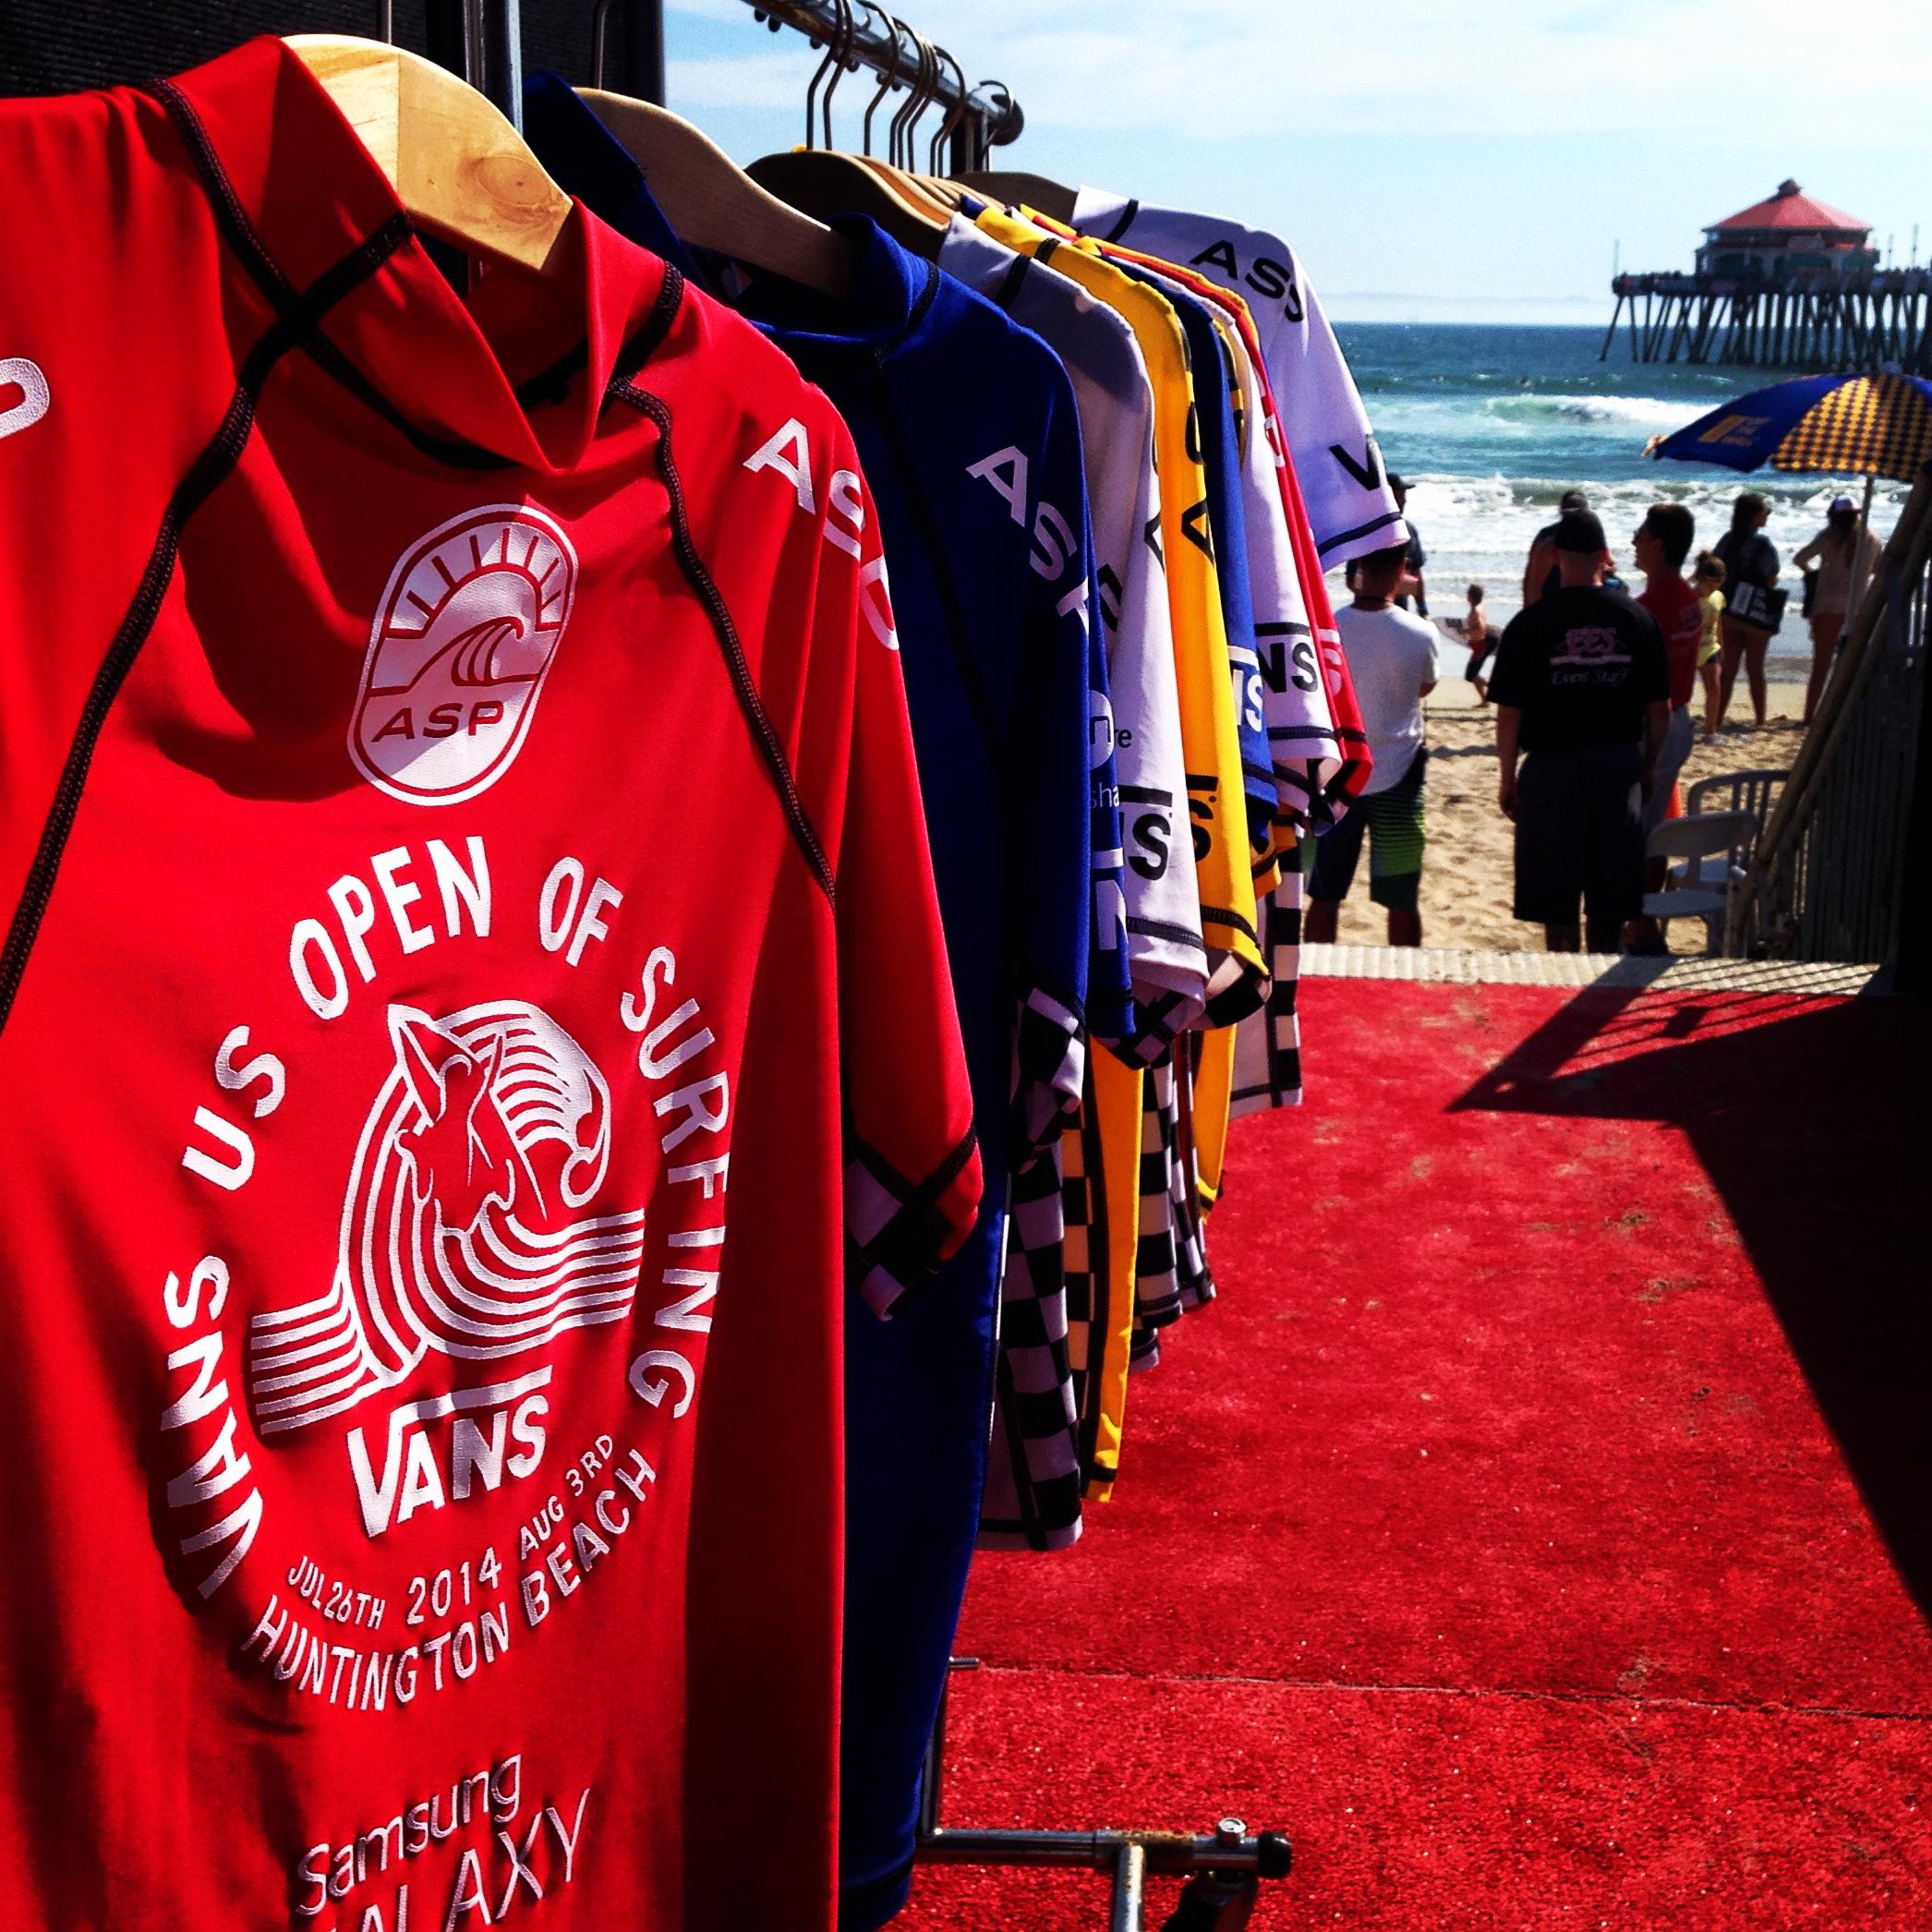 US Open of Surfing 2014 Jerseys